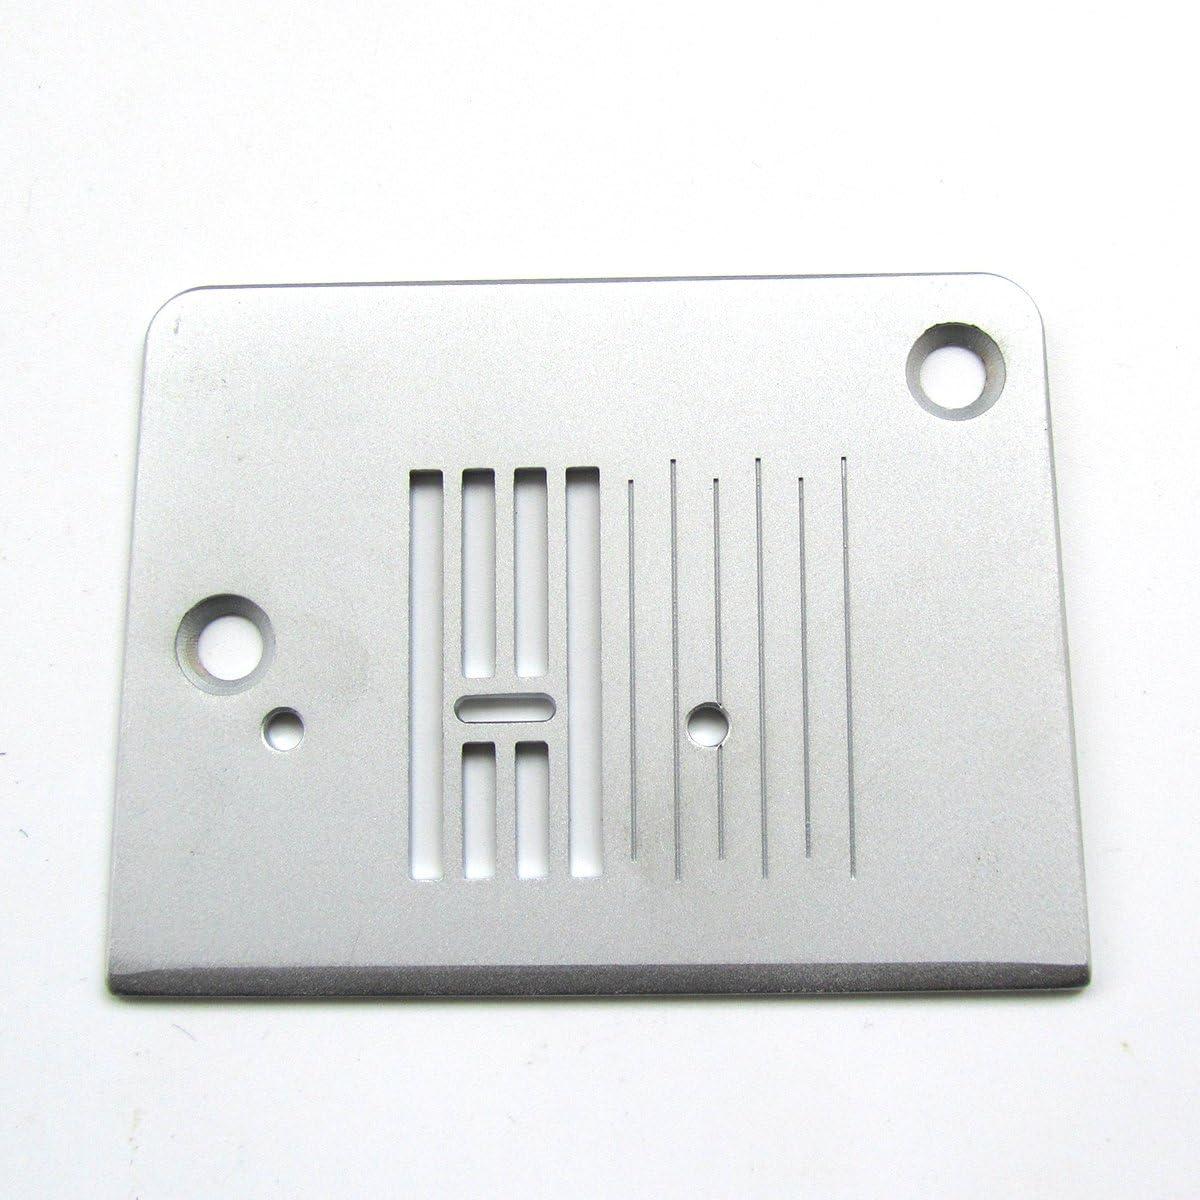 KUNPENG -1 piezas # V620033001 PLACA DE GARGANTA DE AGUJA PARA Singer 1116 1120 1525 1748, 2250,Bernette 12